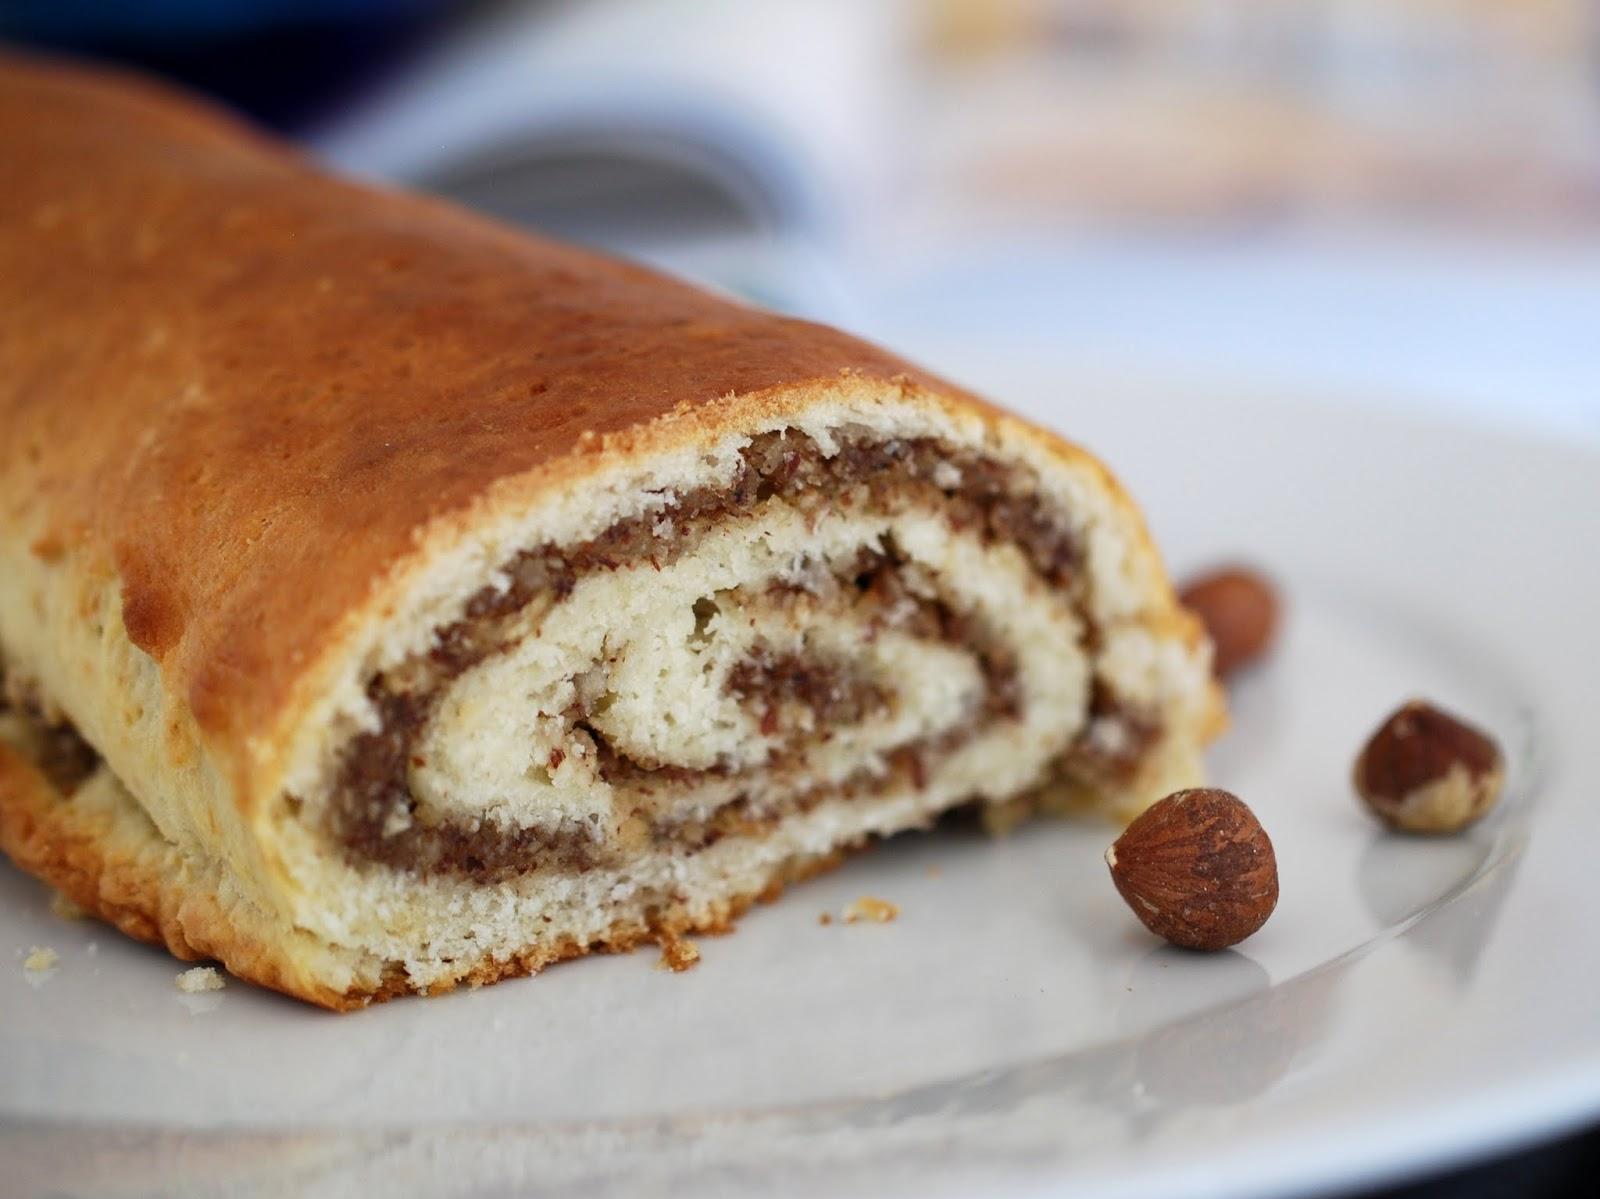 Tasty Tuesday Rezept Leckere Haselnussrolle fürs Kaffeekränzchen